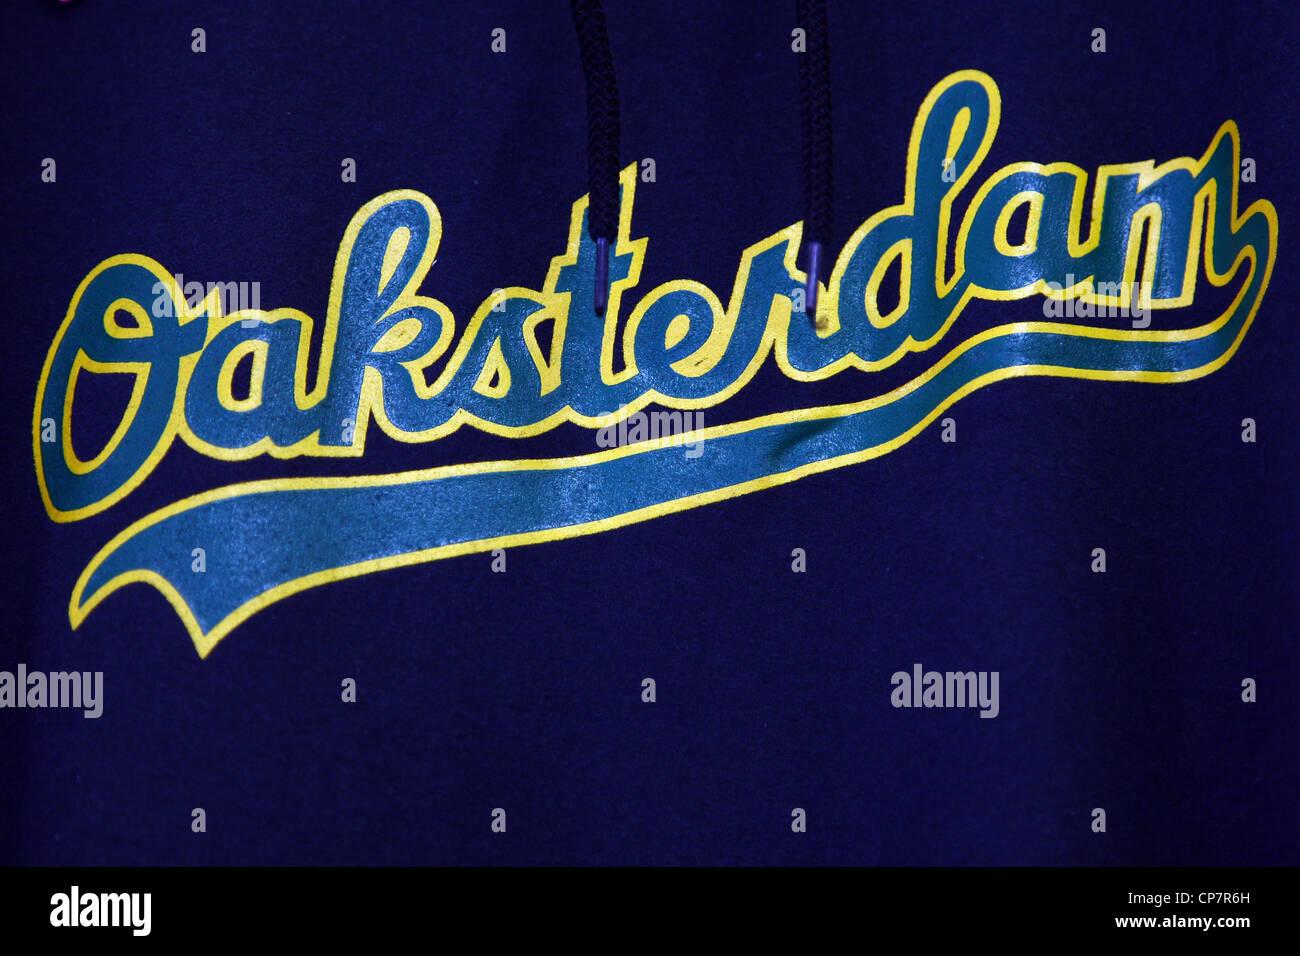 OAKSTERDAM LOGO OAKSTERDAM CANNABIS GIFT STORE 06 October 2011 - Stock Image